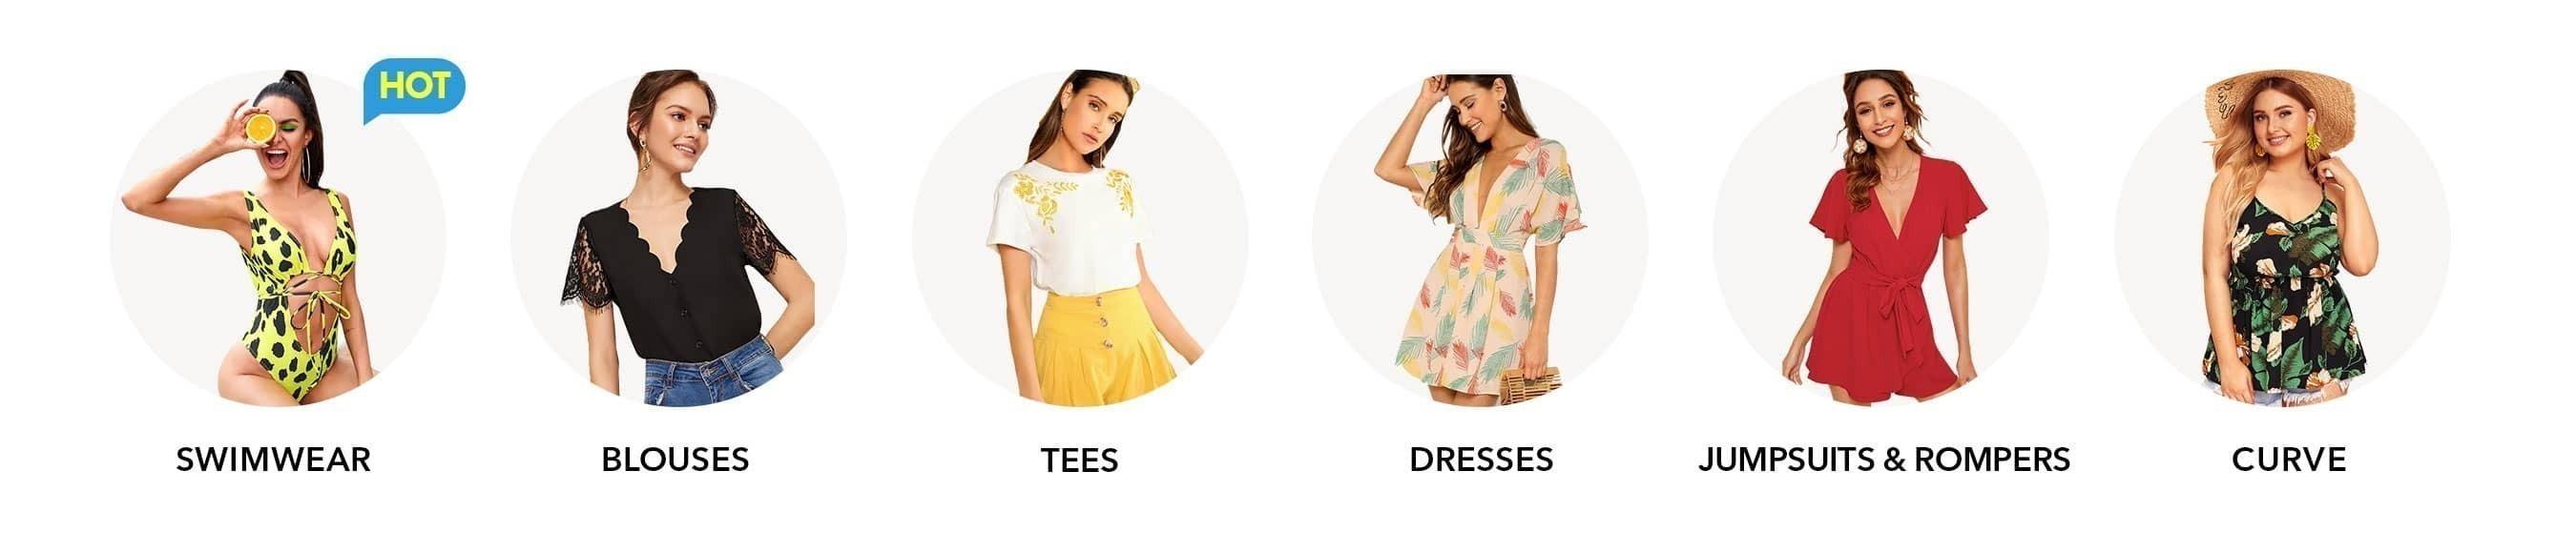 42014de4a91b9 Shop Trendy Women's Fashion | SHEIN